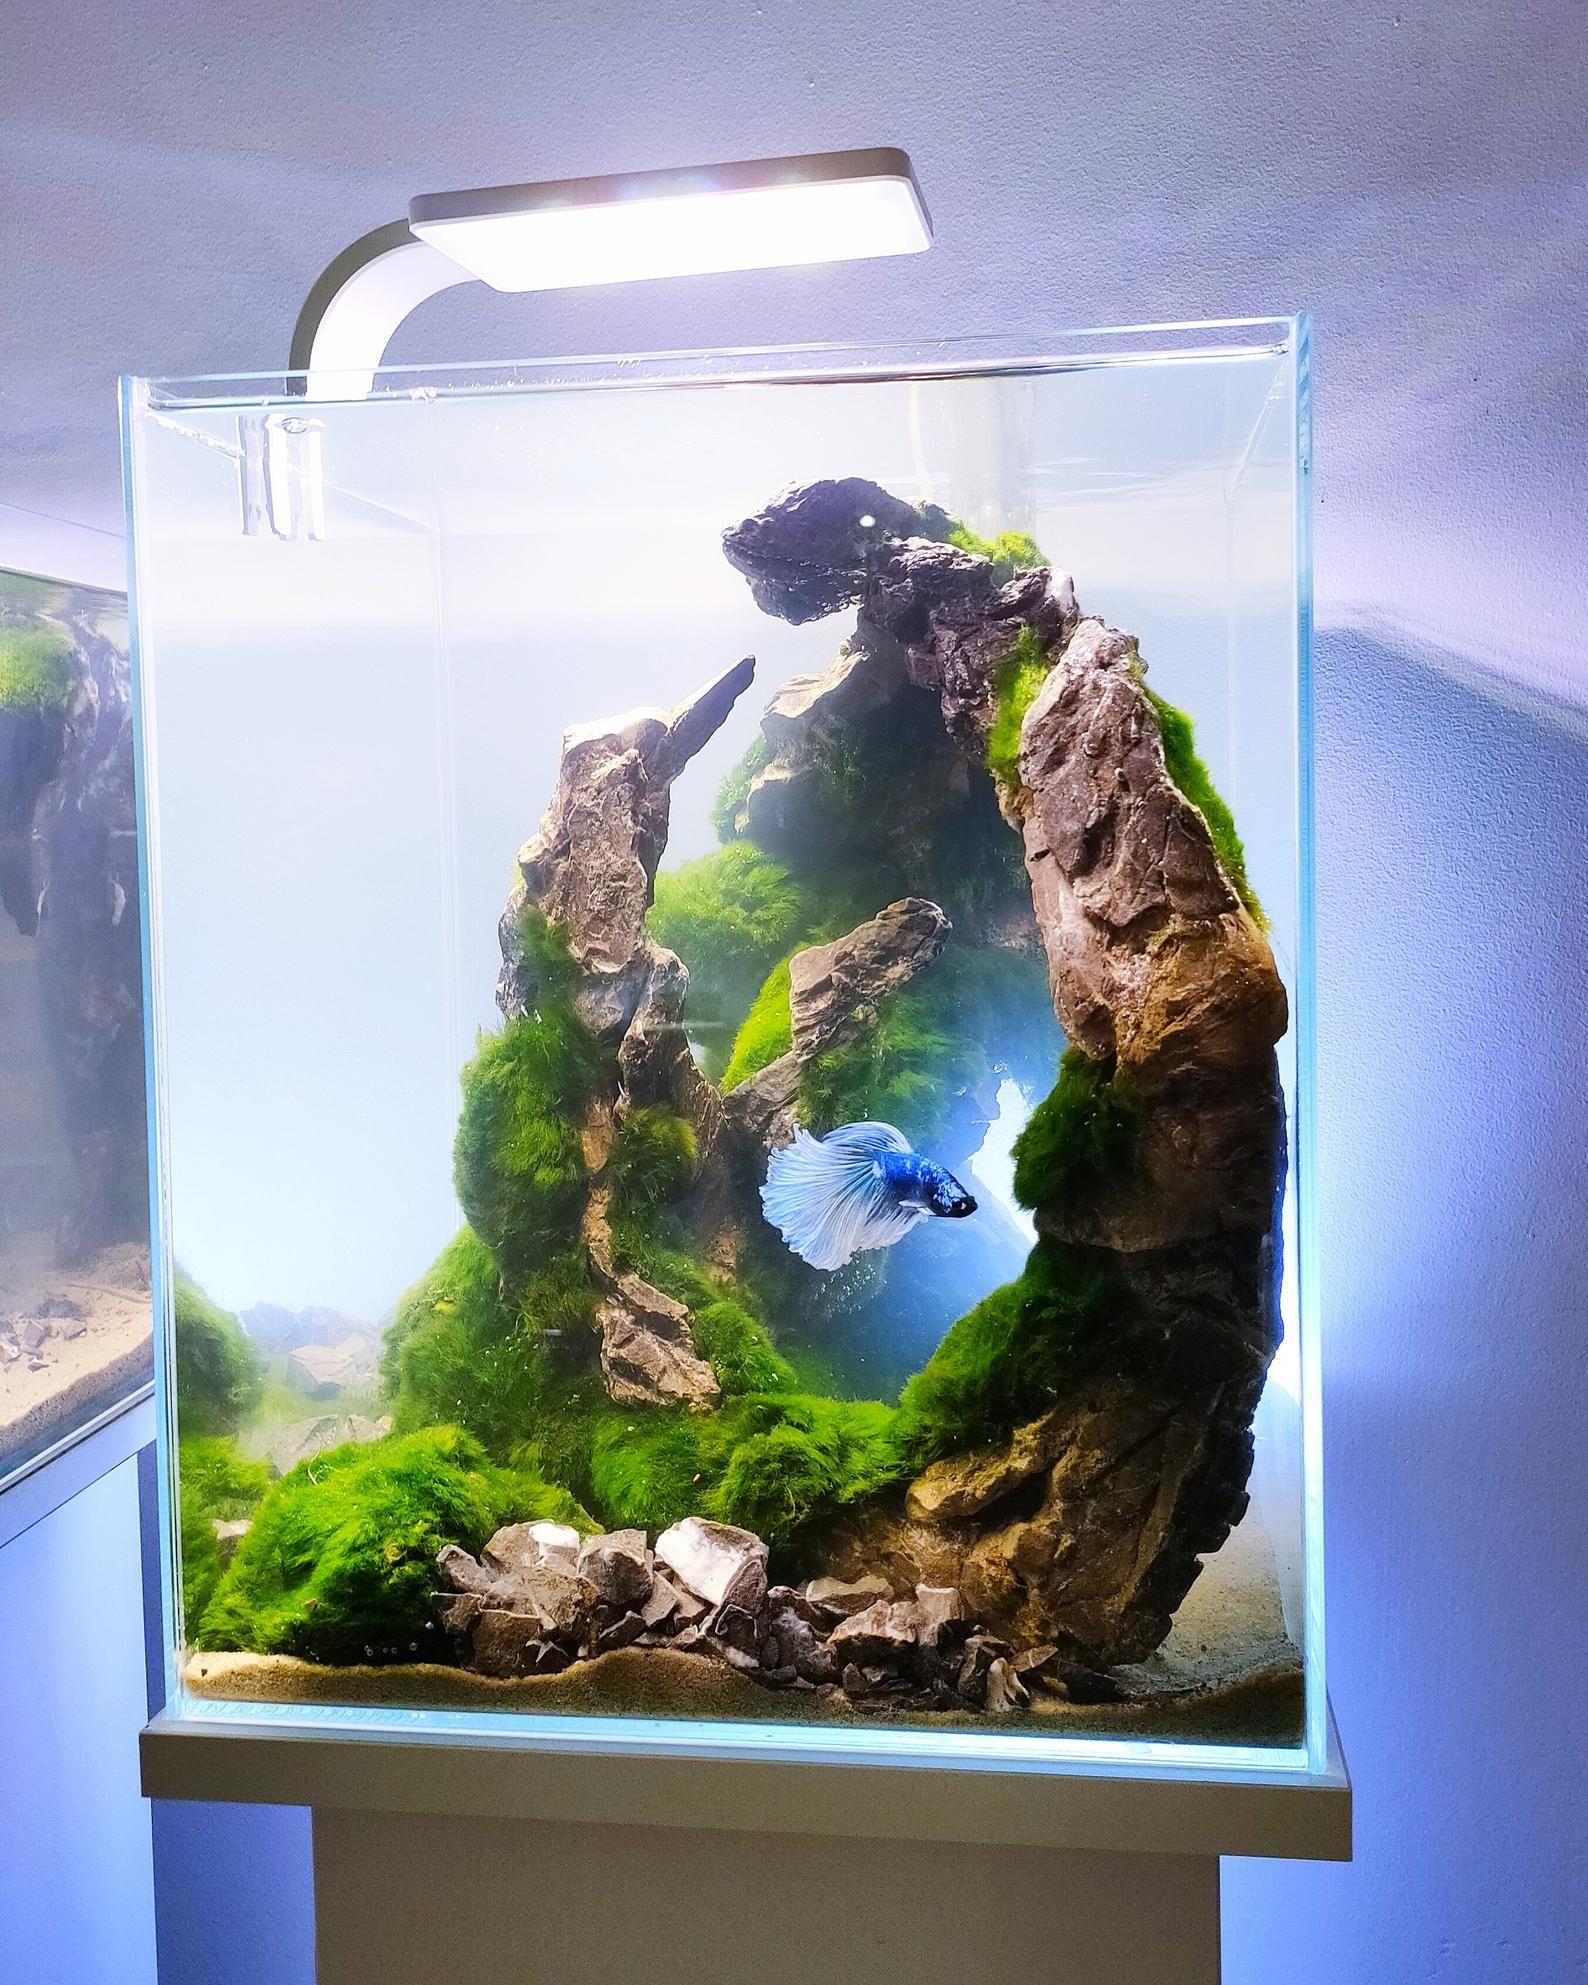 Ancient Stone Glued Scape For Nano Aquarium Etsy In 2020 Nano Aquarium Betta Tank Cool Fish Tanks